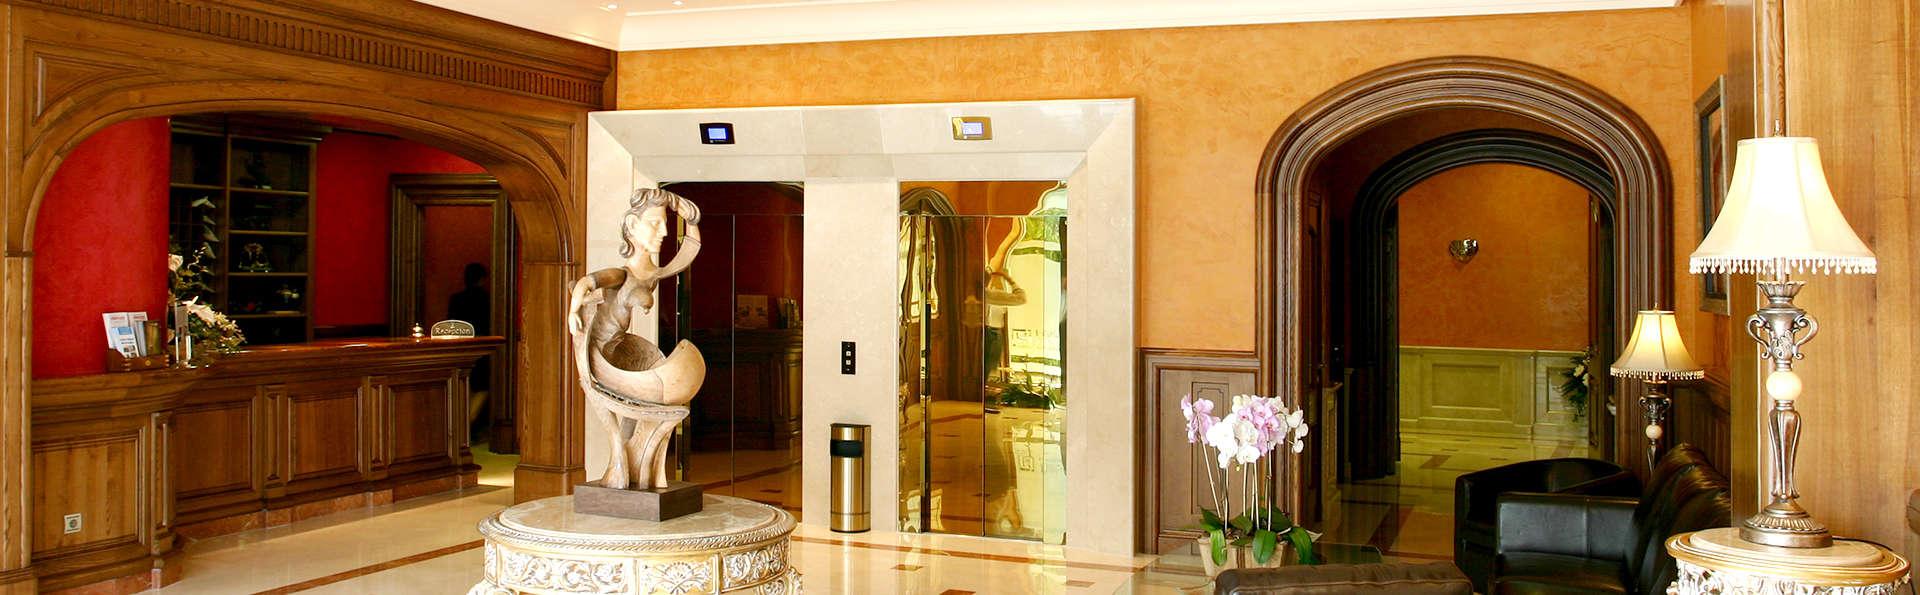 Hotel Sercotel Guadiana - Edit_Hall.jpg